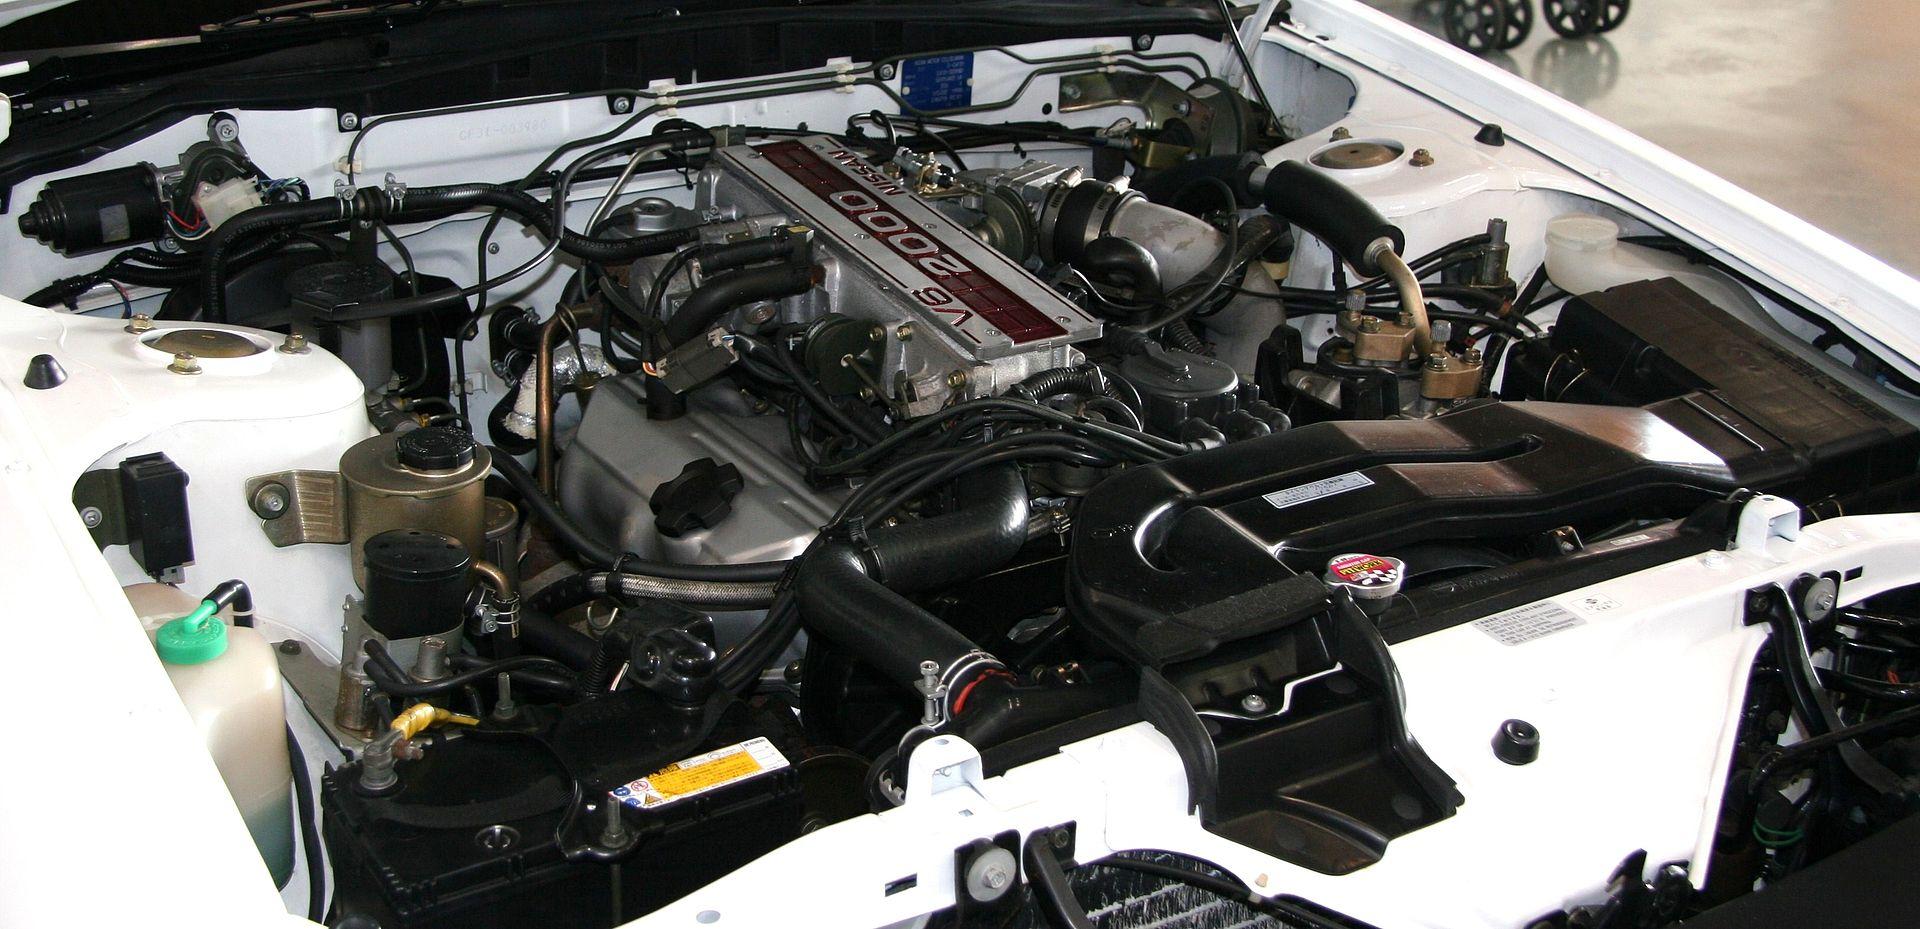 Nissan vg engine wikipedia for Nissan motor acceptance corporation customer service number